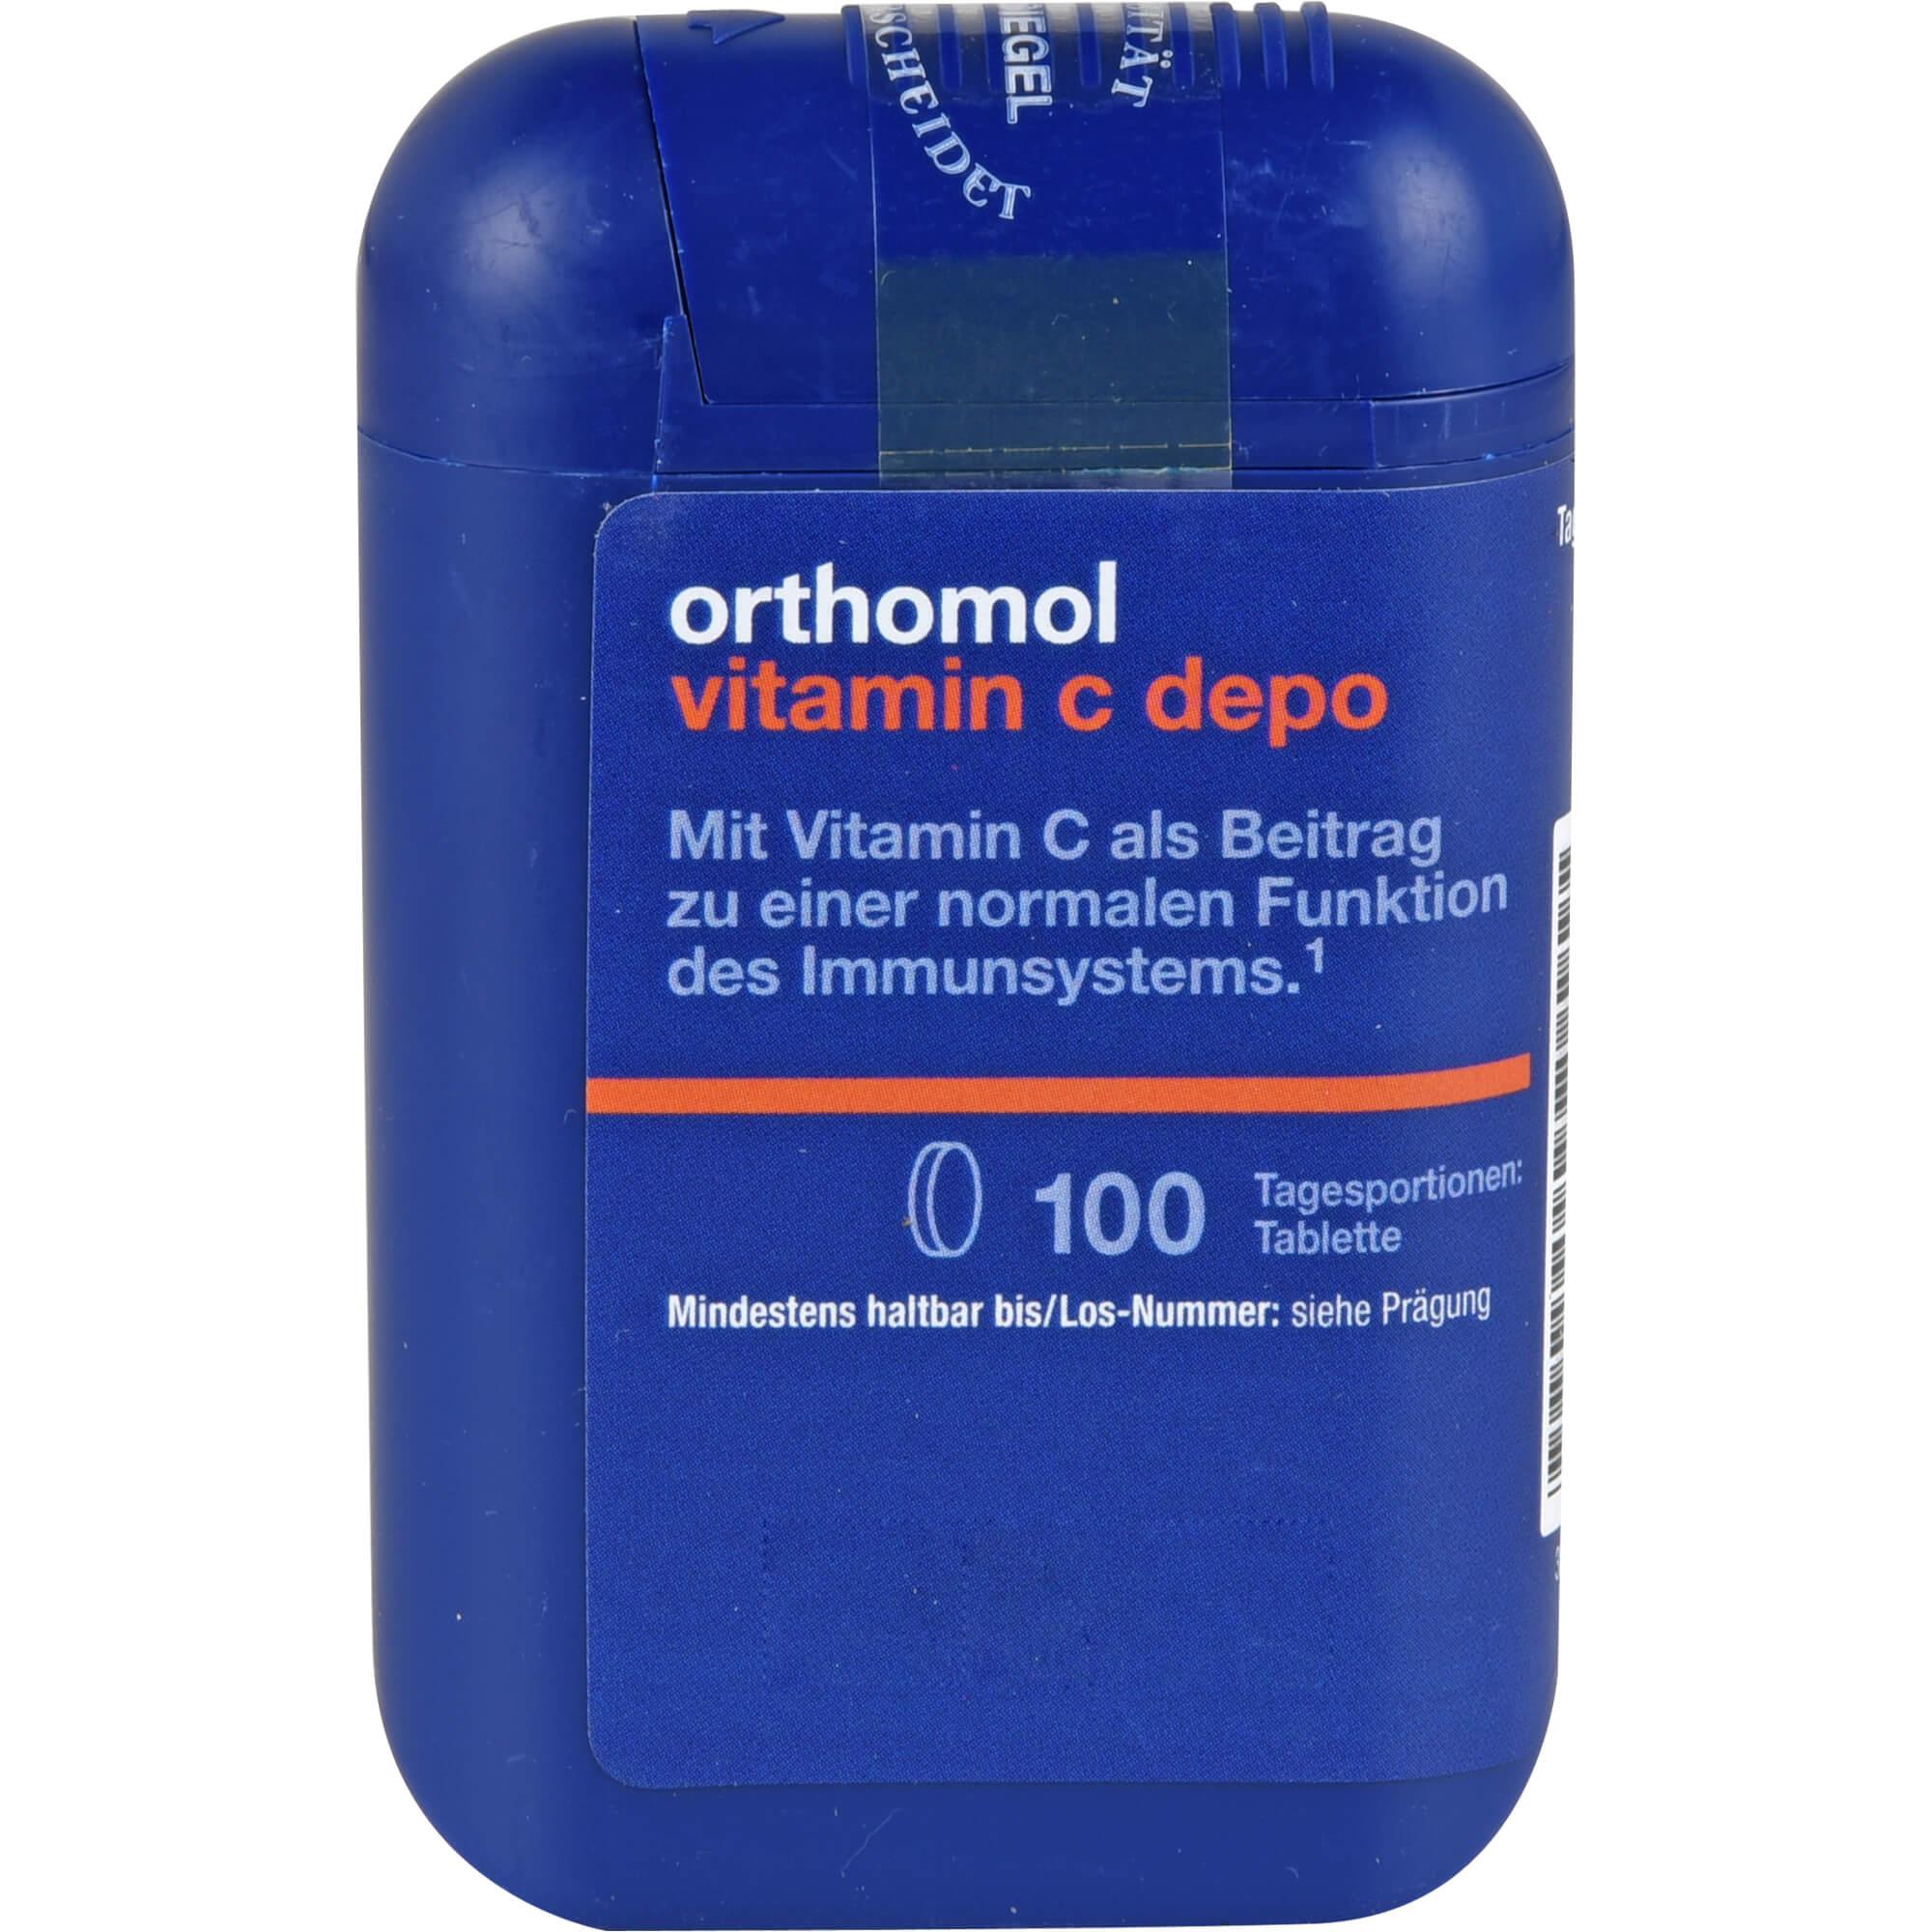 ORTHOMOL Vitamin C Depo Tabletten